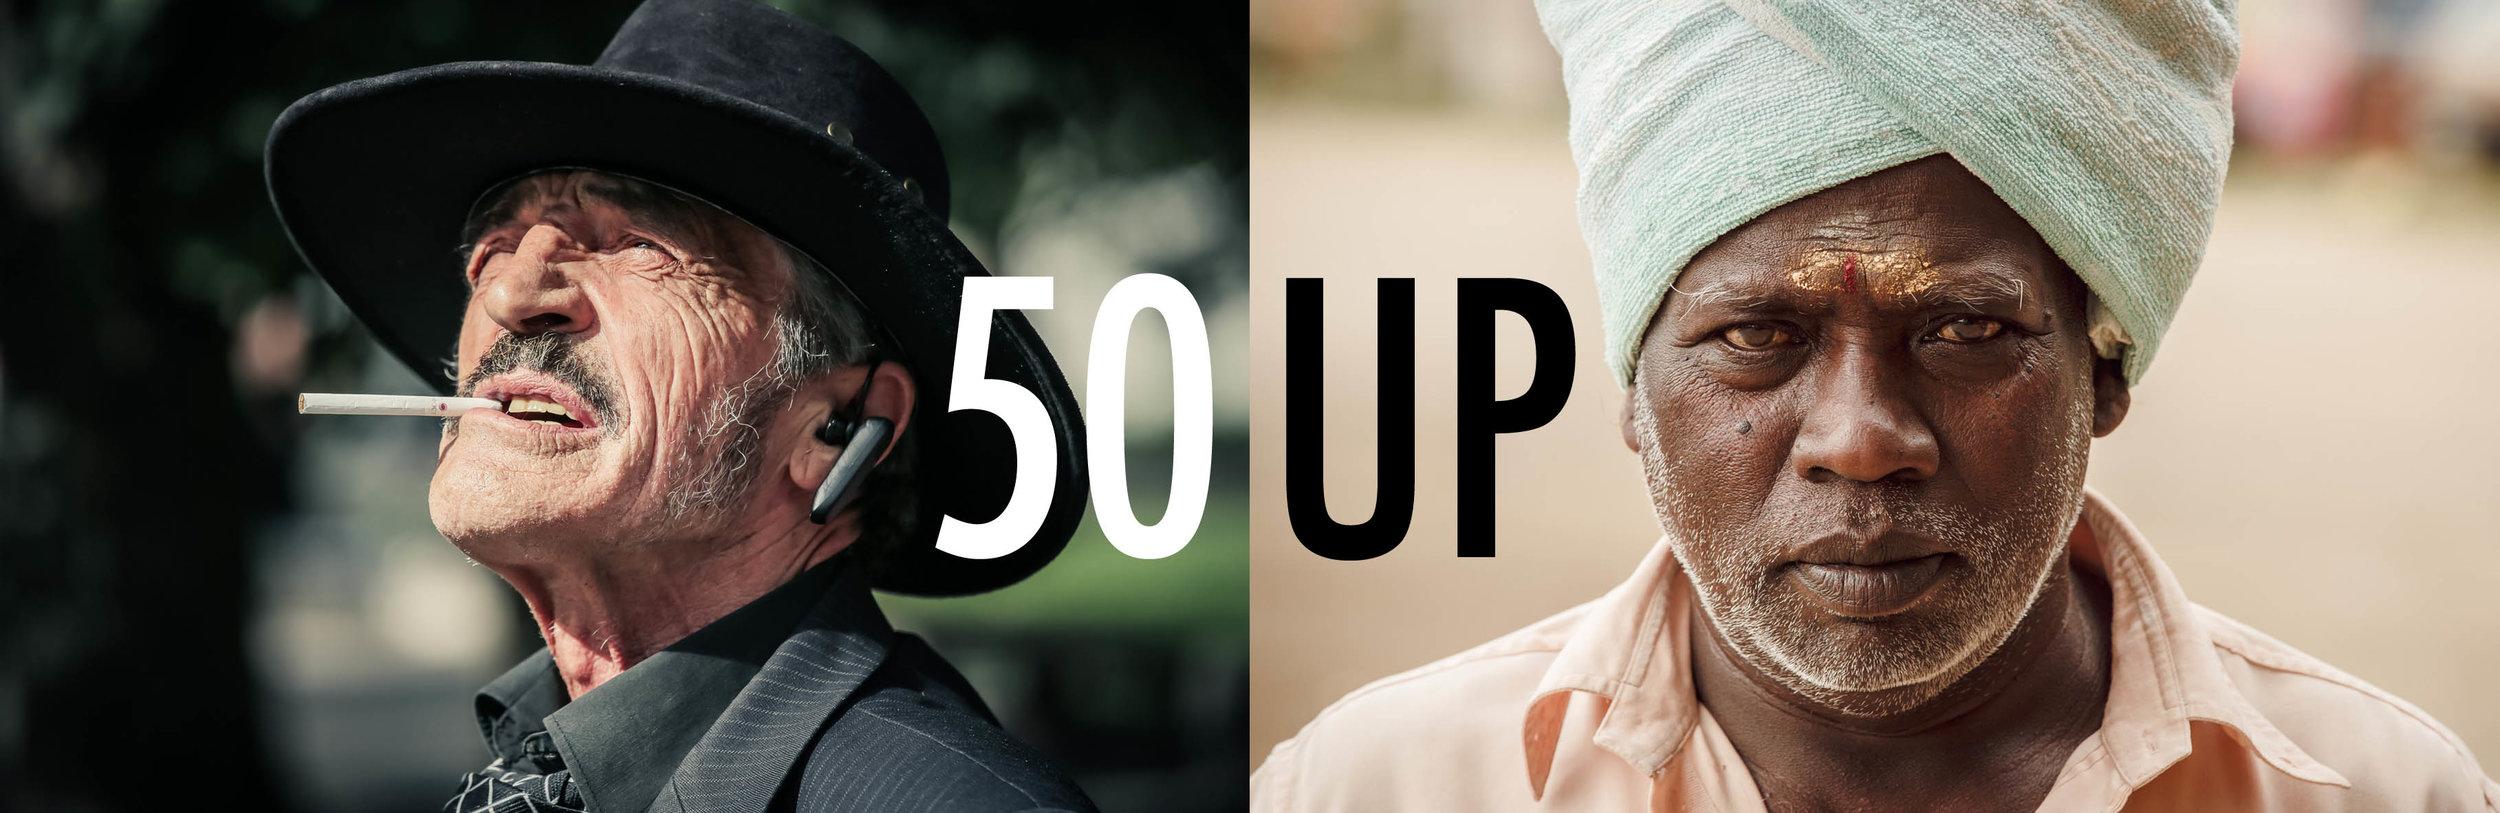 50UP.jpg